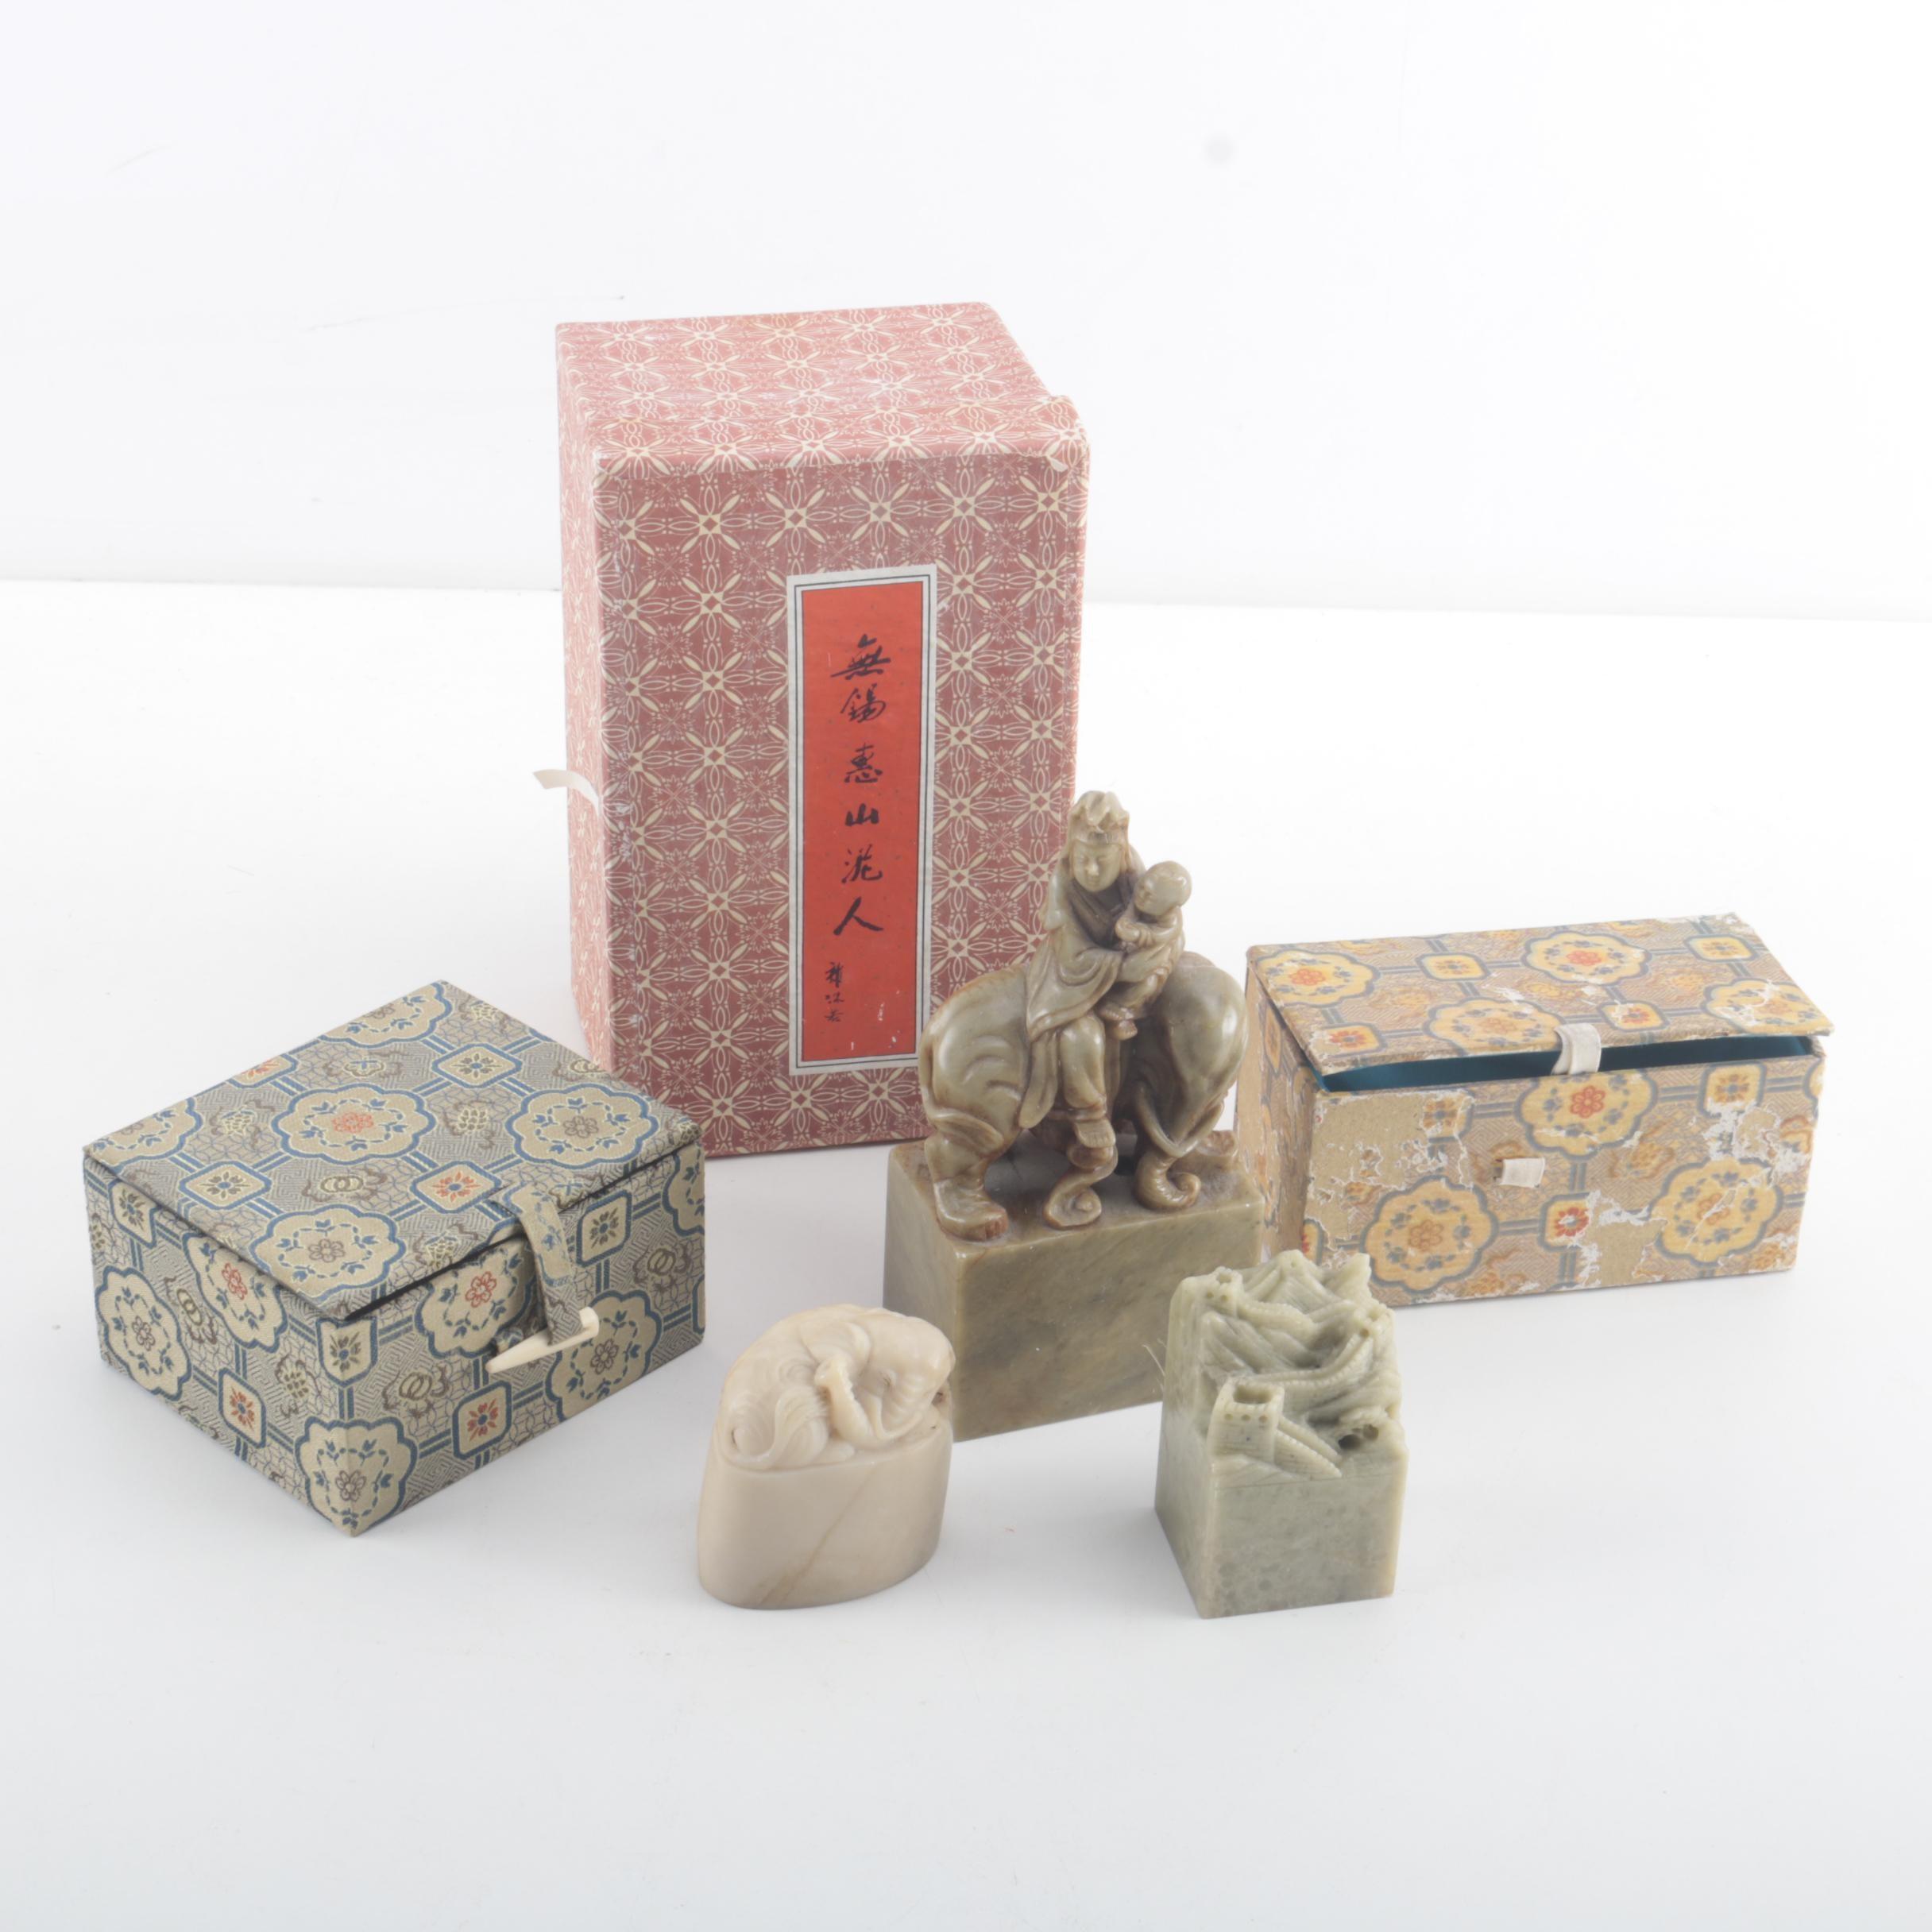 Assortment of Chinese Stone Figurines